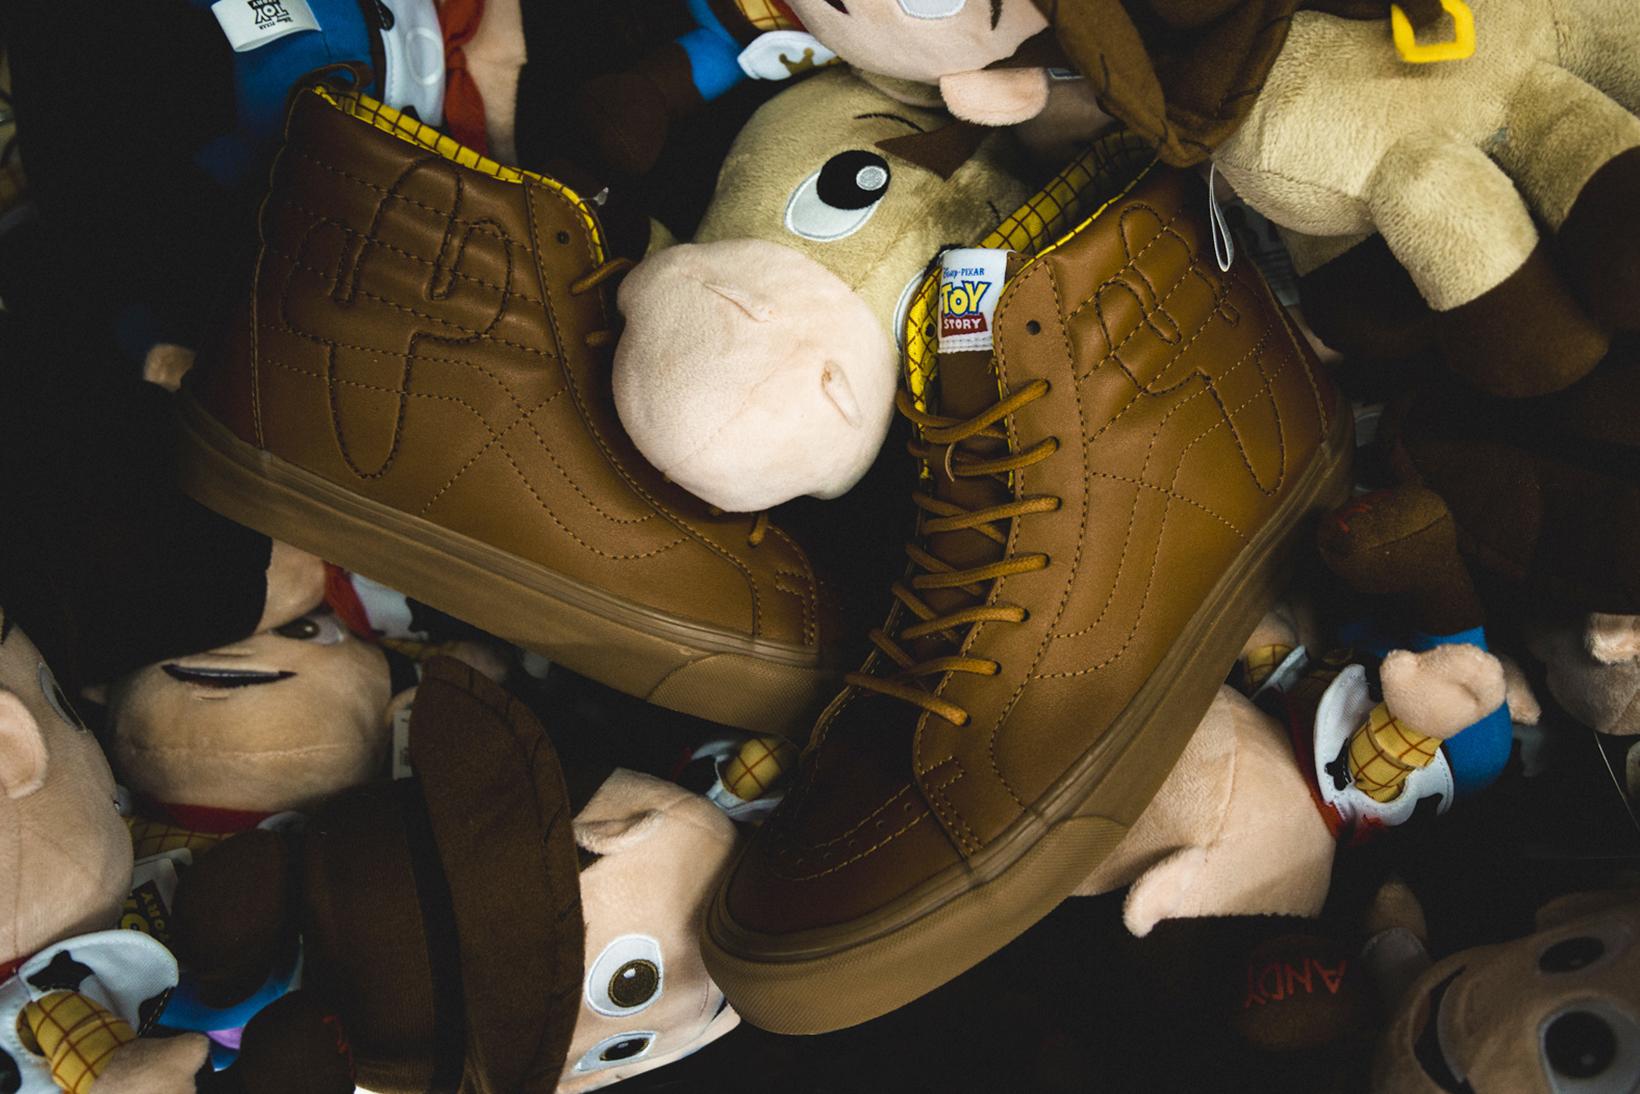 Toy Story Vans Sneakers Woody Buzz Lightyear Disney - 1765033